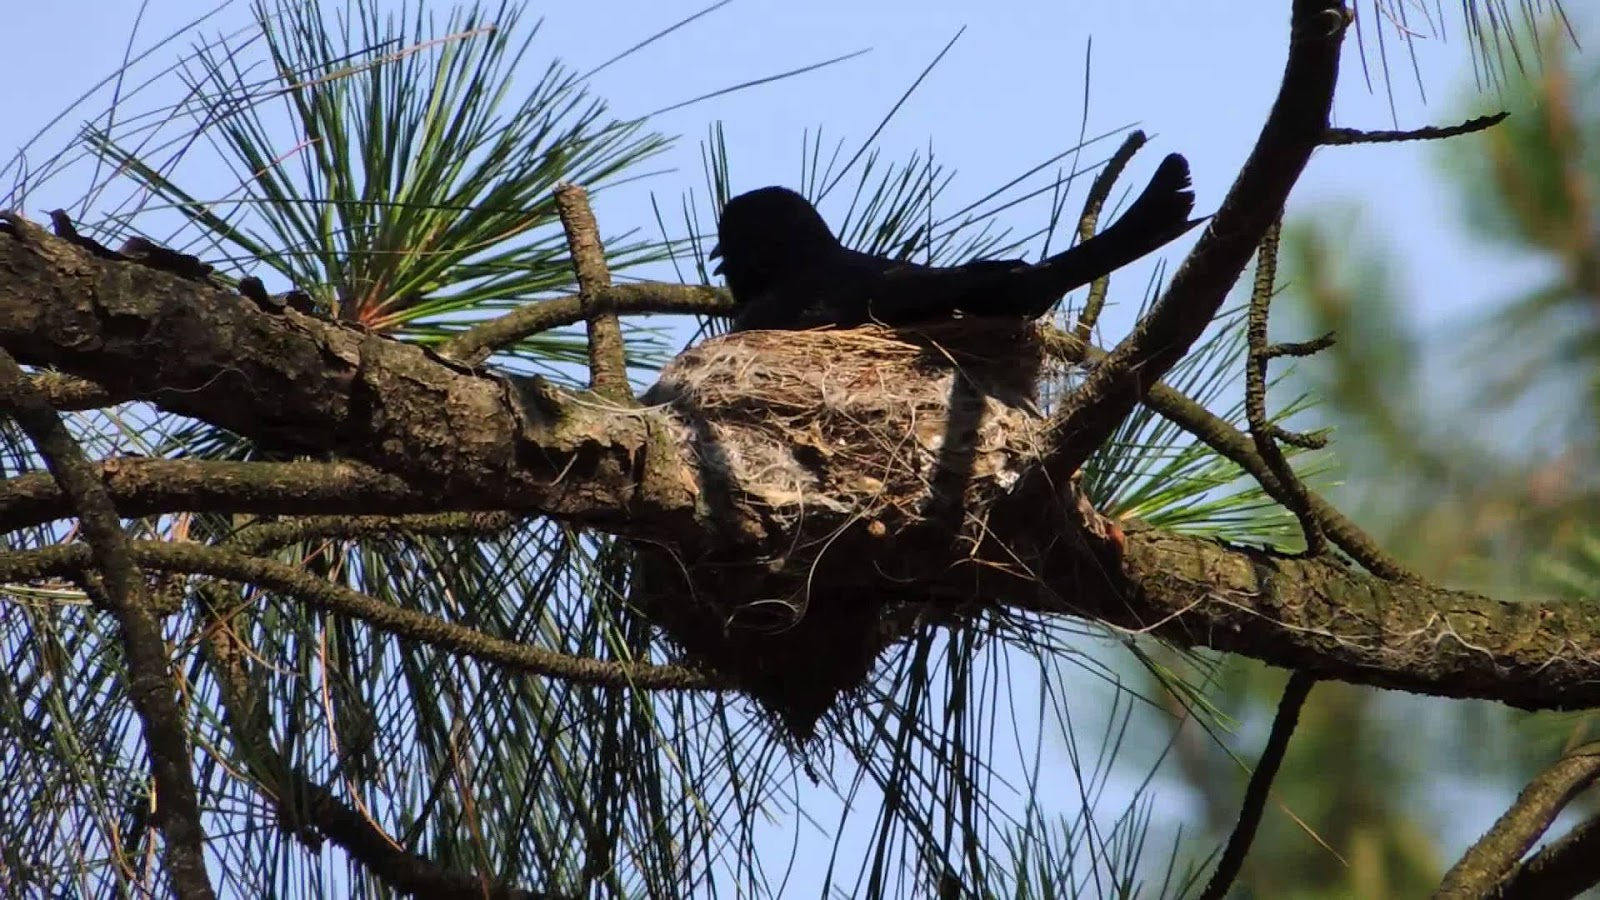 Tổ chim chèo bẻo